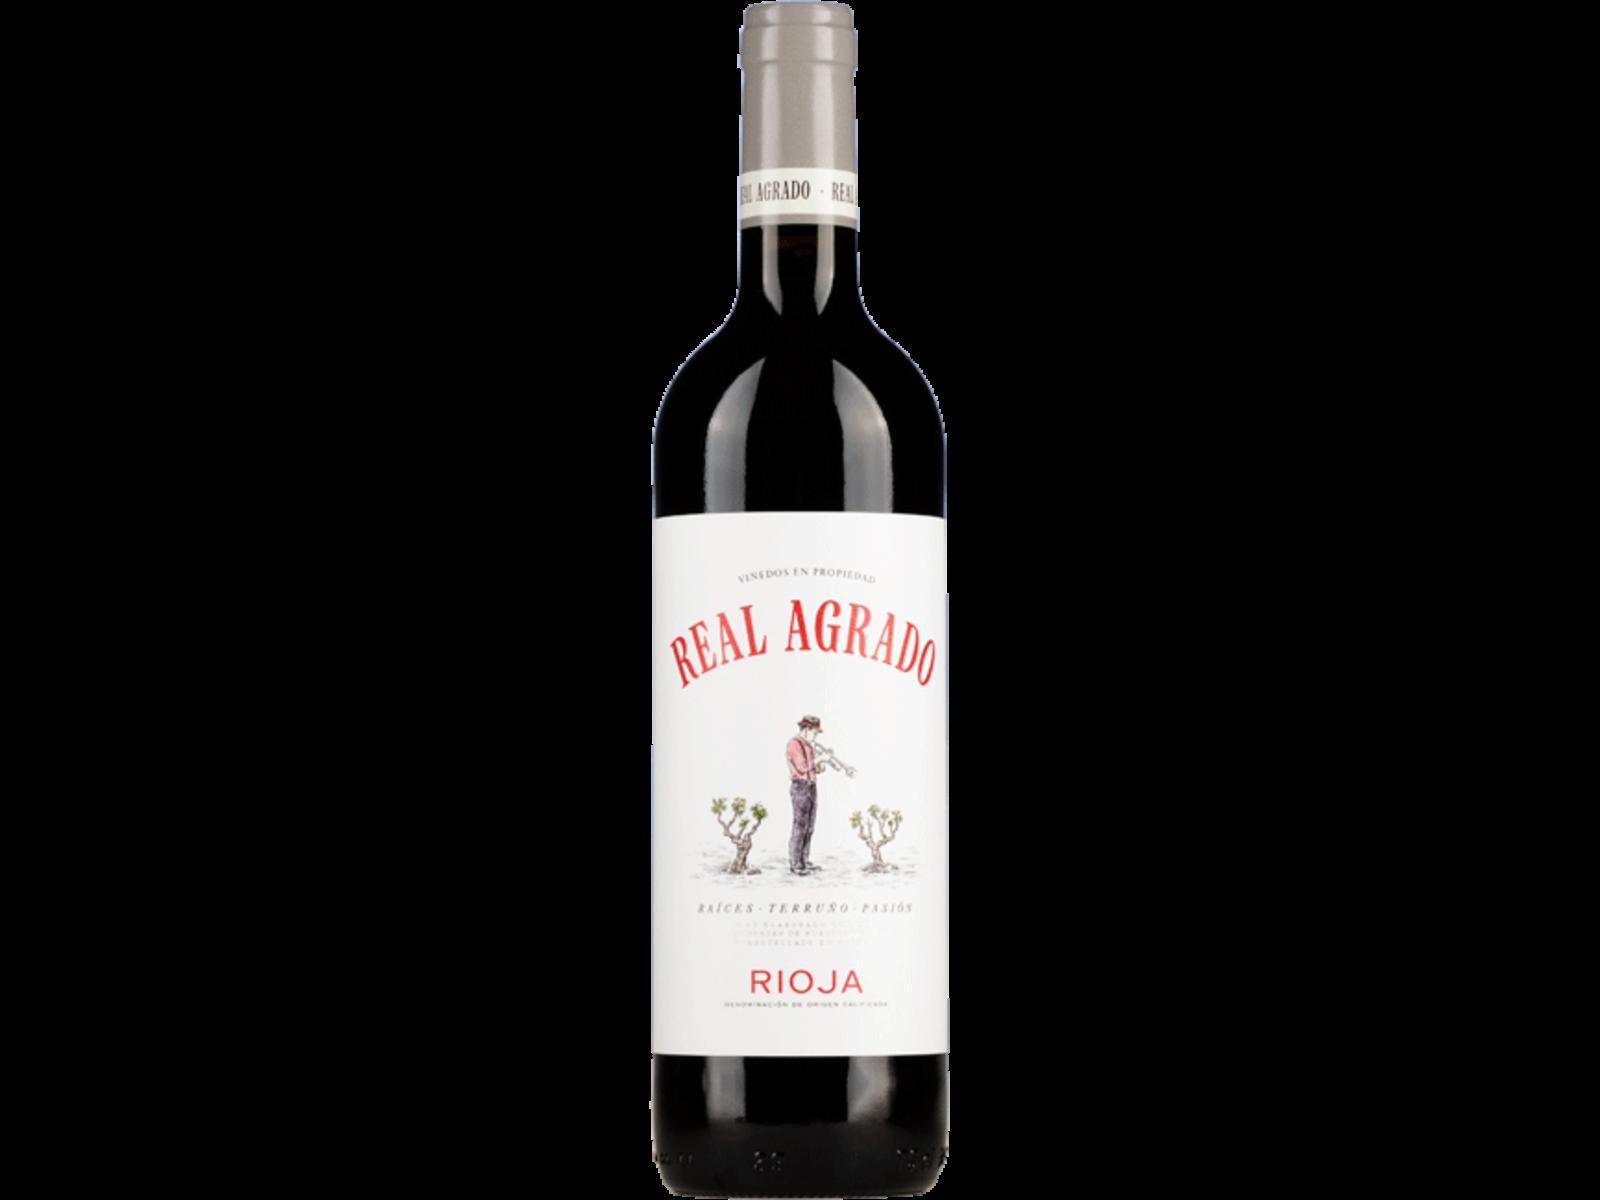 Real Agrado/Viñedos Alfaro Real Agrado Rioja Tinto